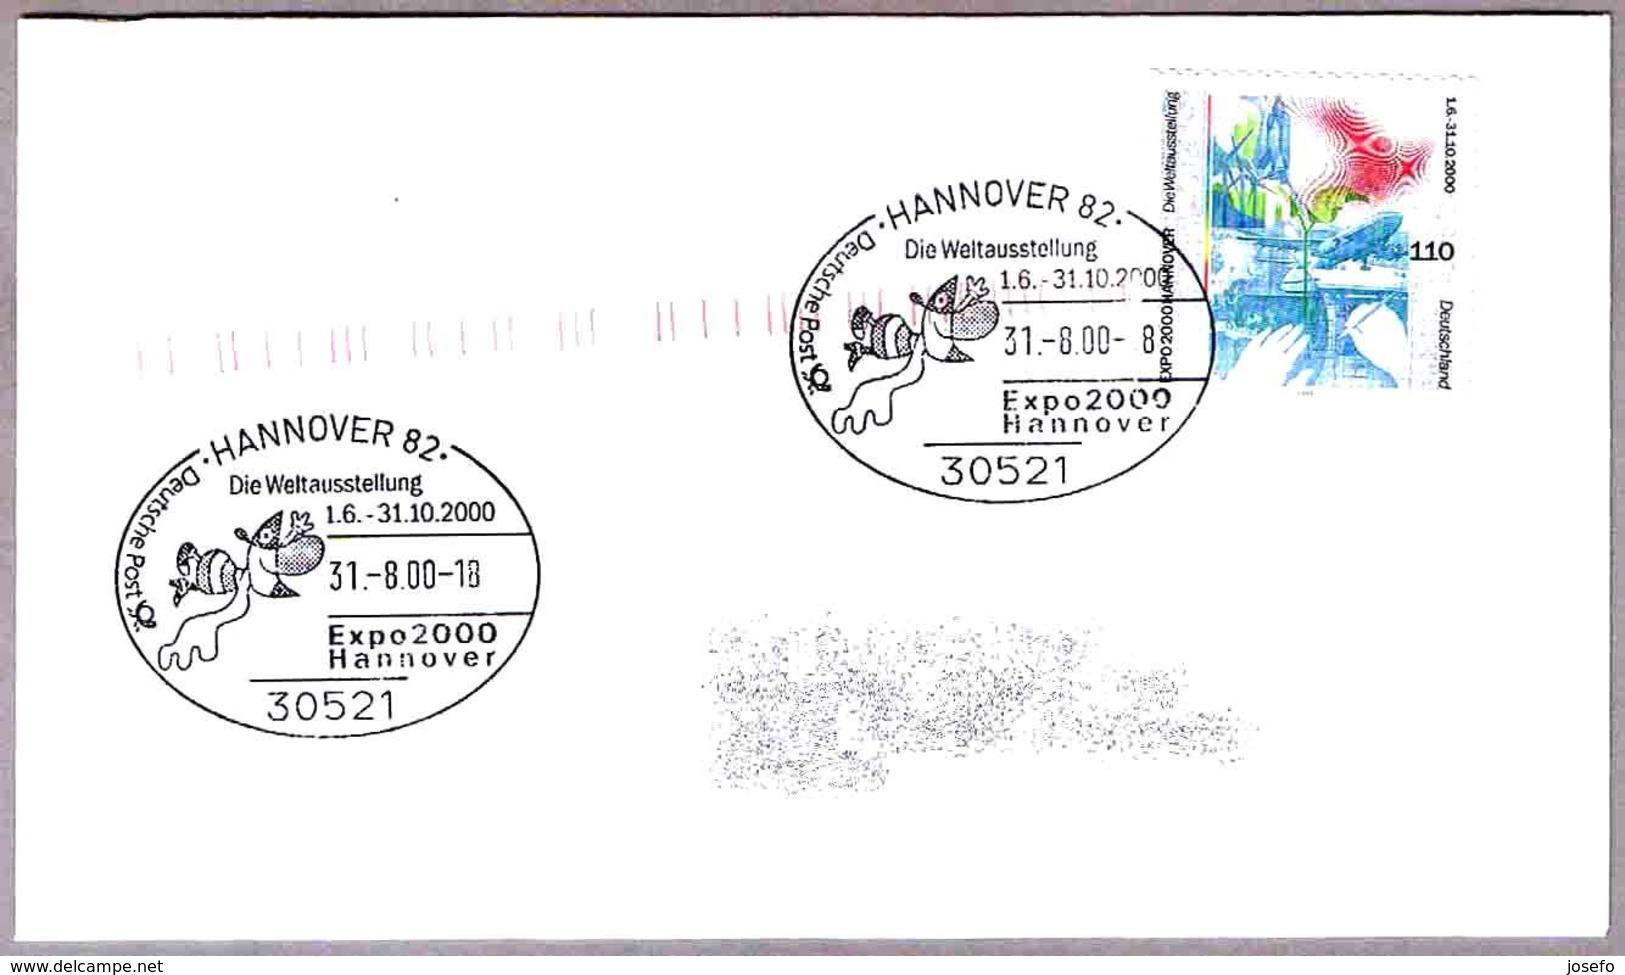 EXPO 2000 HANNOVER. - 2000 – Hanover (Germany)